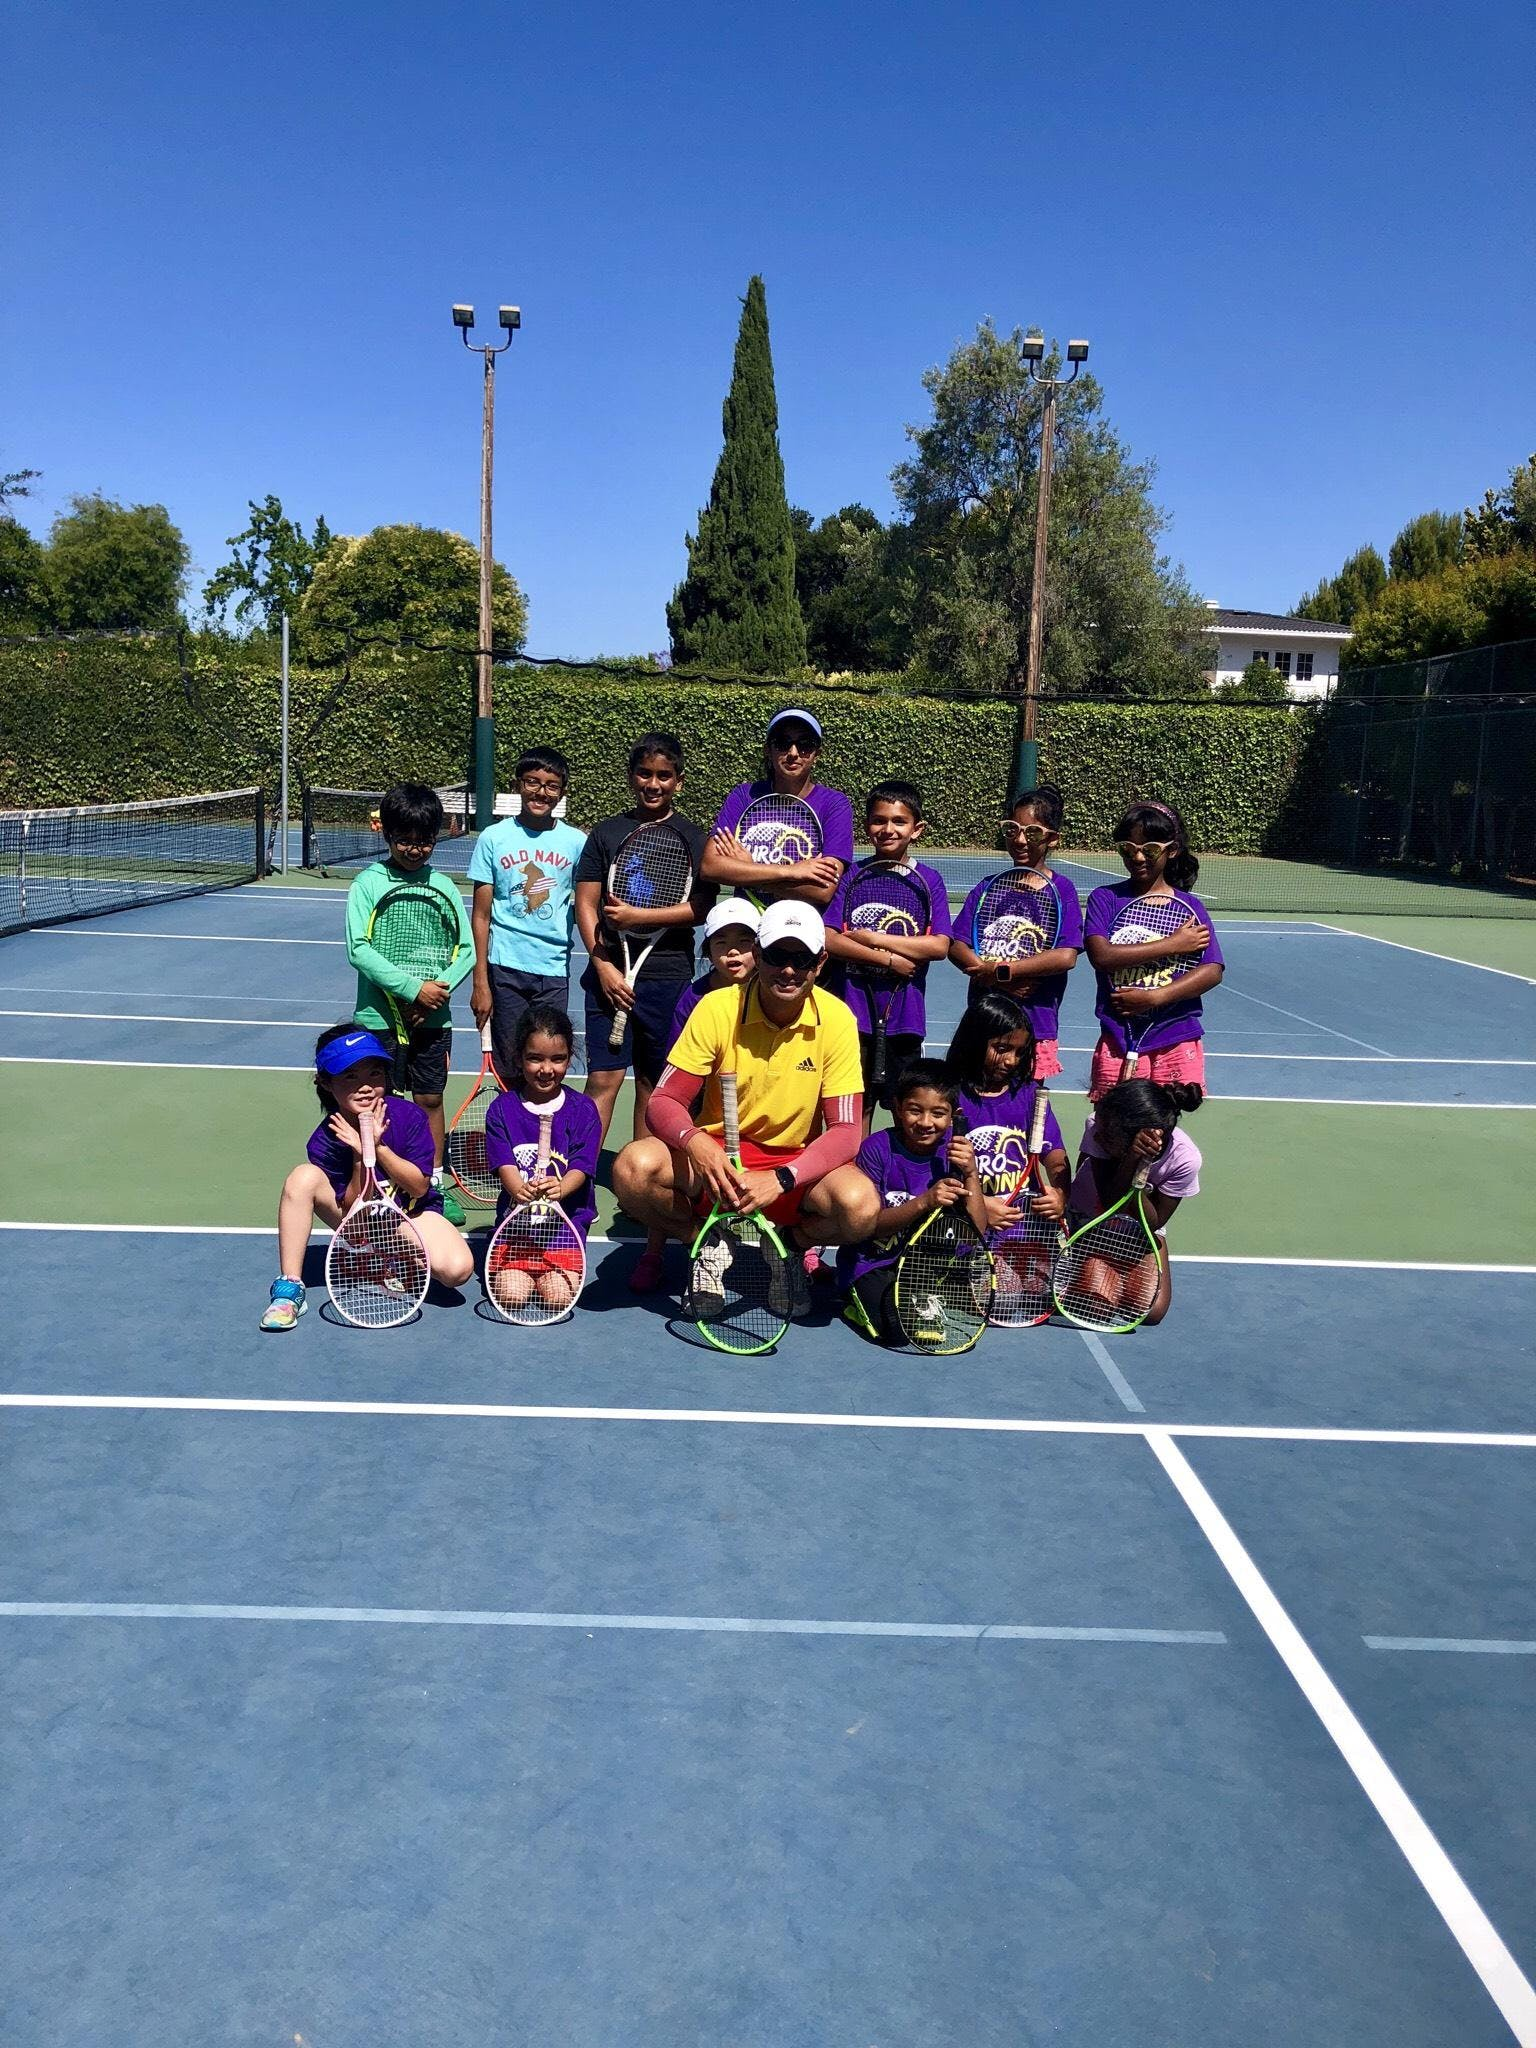 Paid Fun After School Tennis Program at Gardn